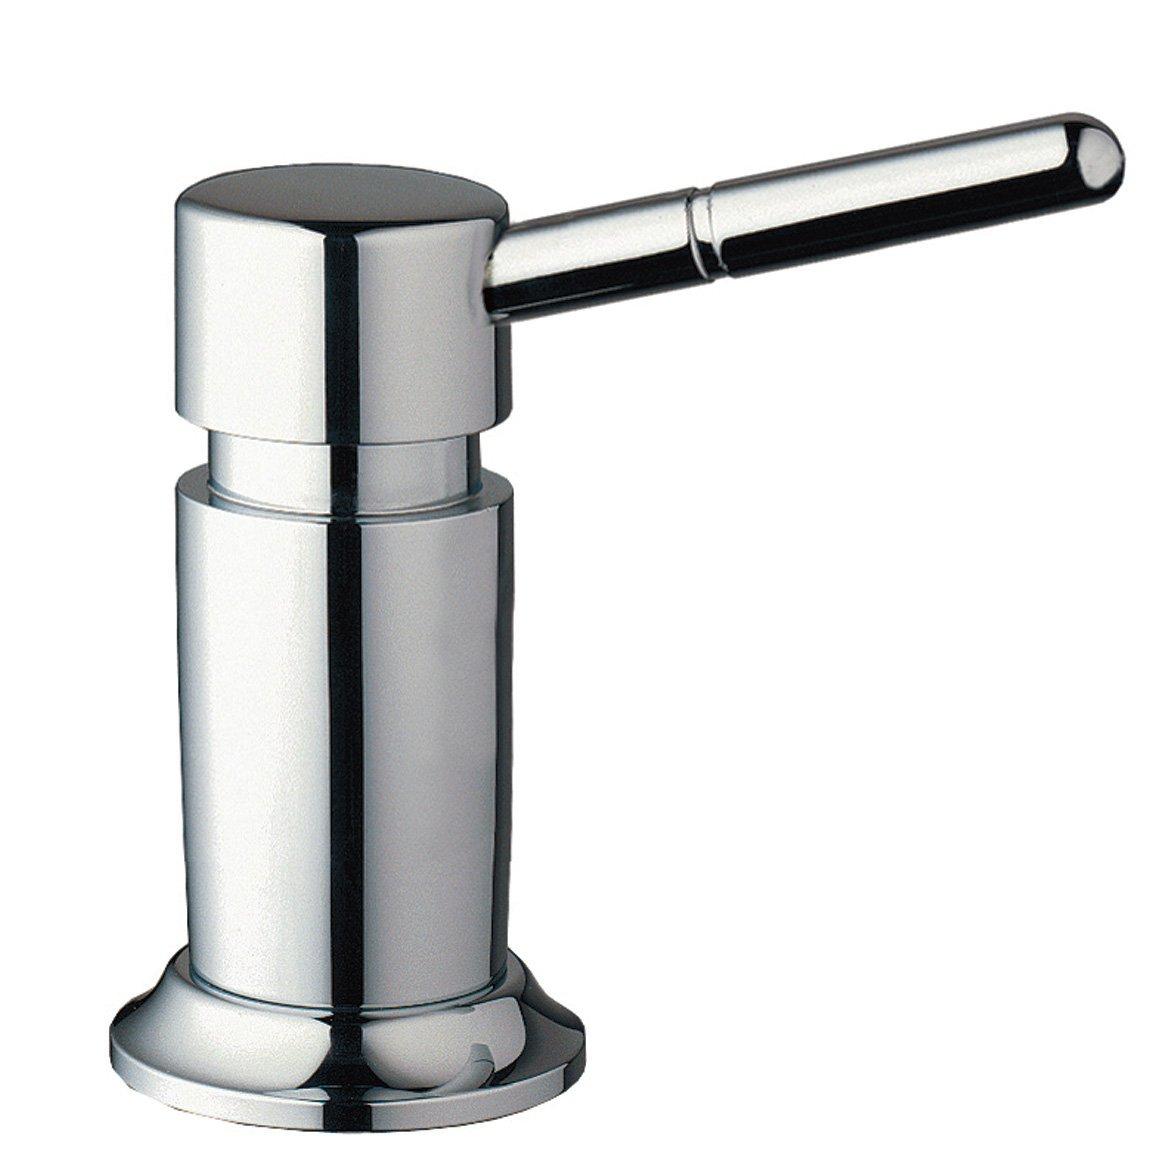 Deluxe Xl Soap/Lotion Dispenser